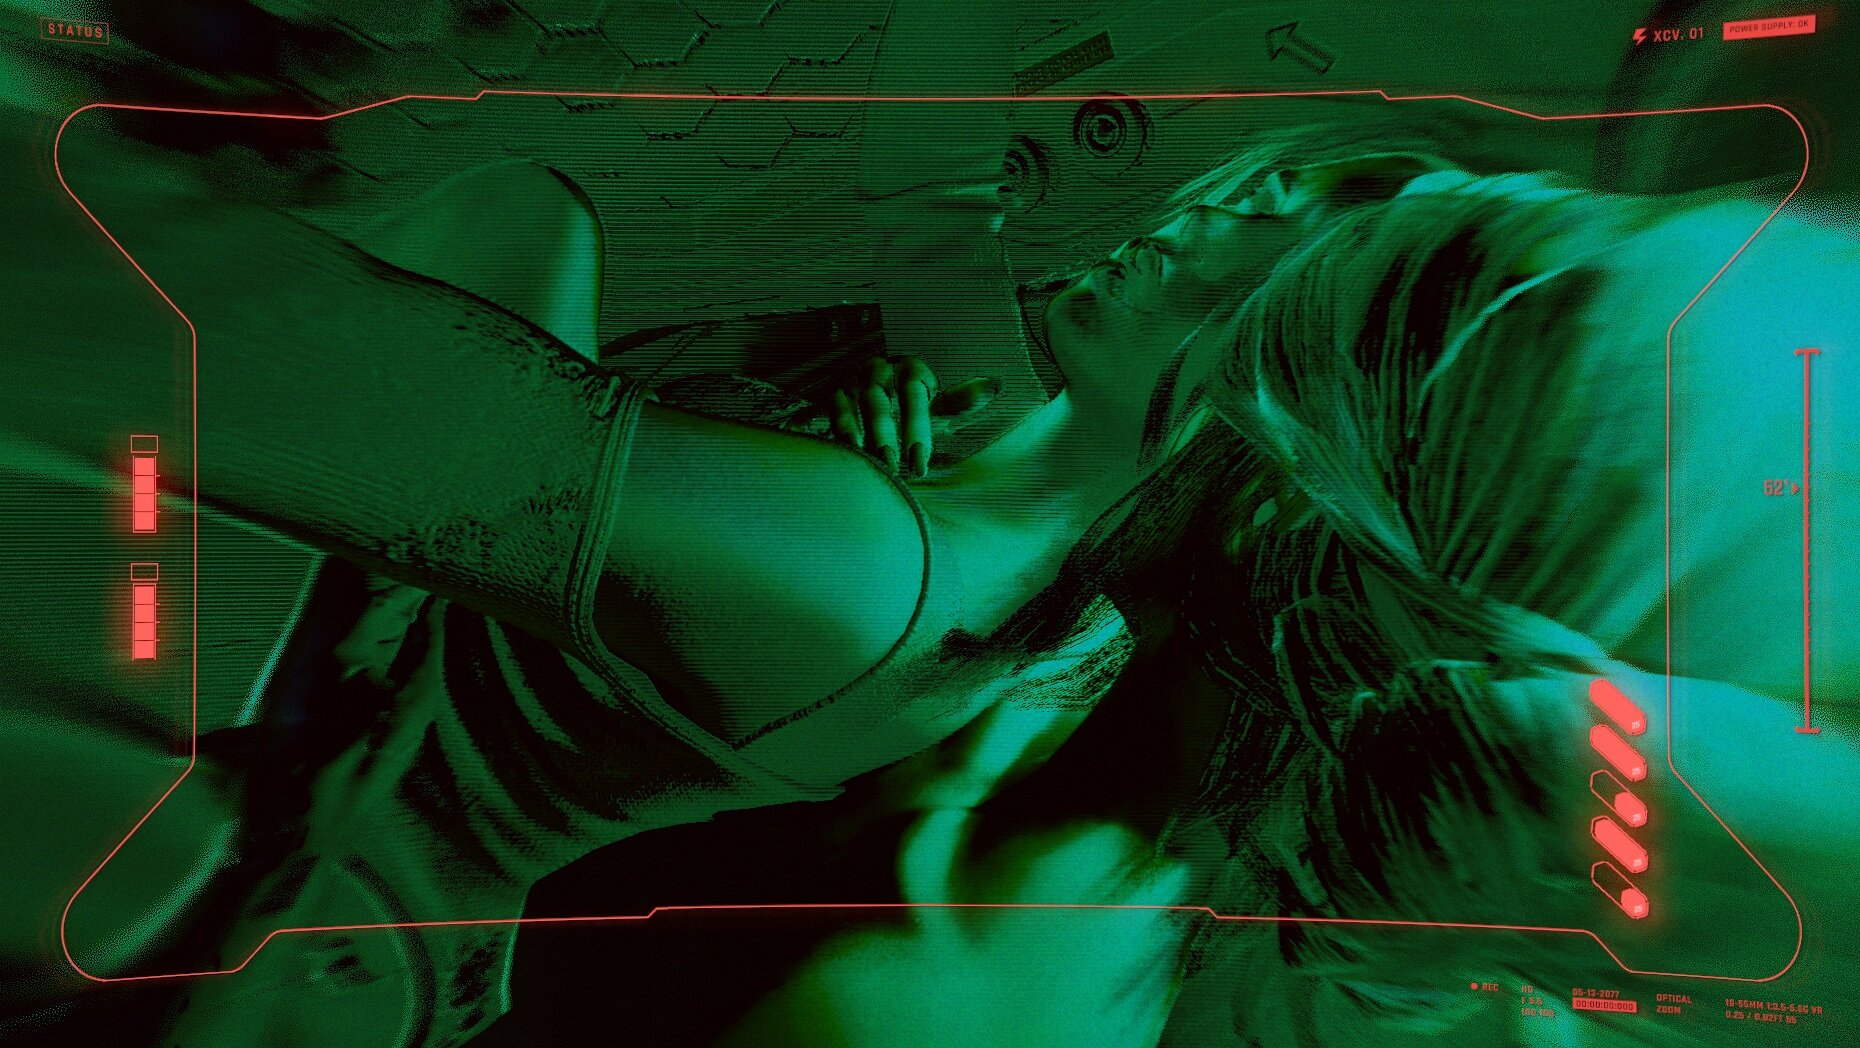 Cyberpunk 2077 Девочки синхронизировались